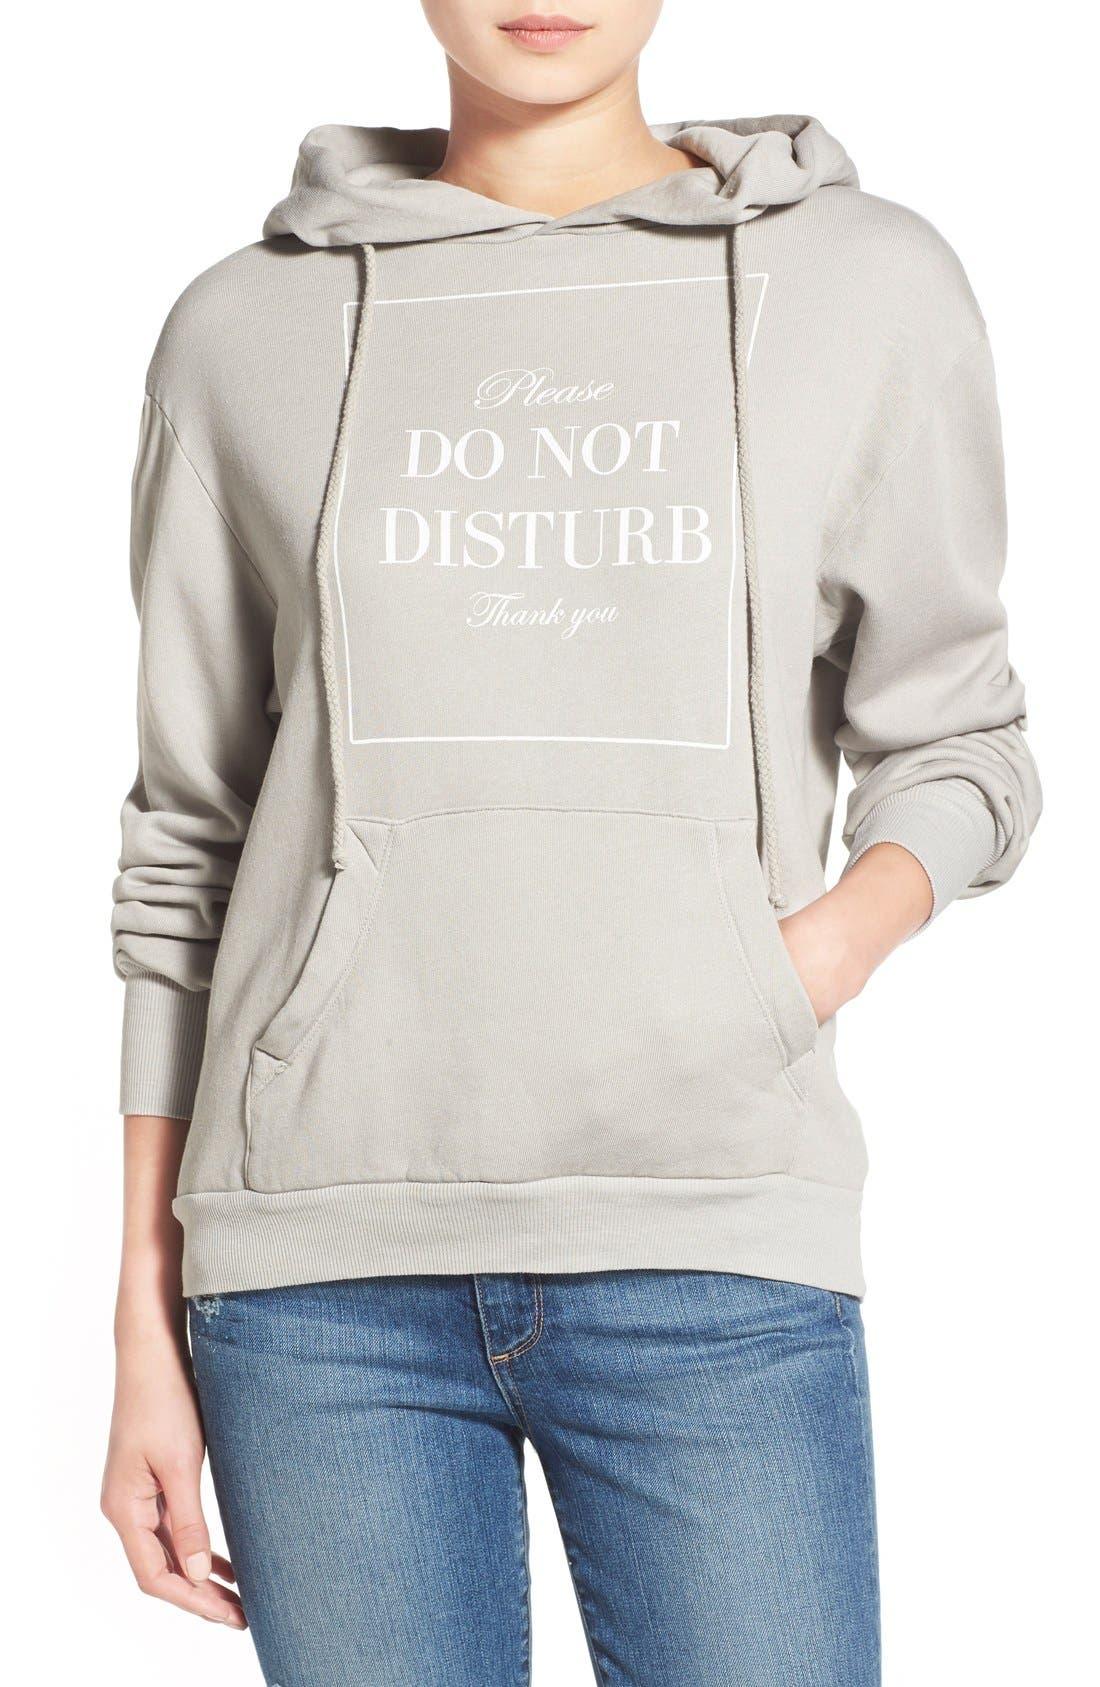 'Please Do Not Disturb' Hooded Sweatshirt, Main, color, 060